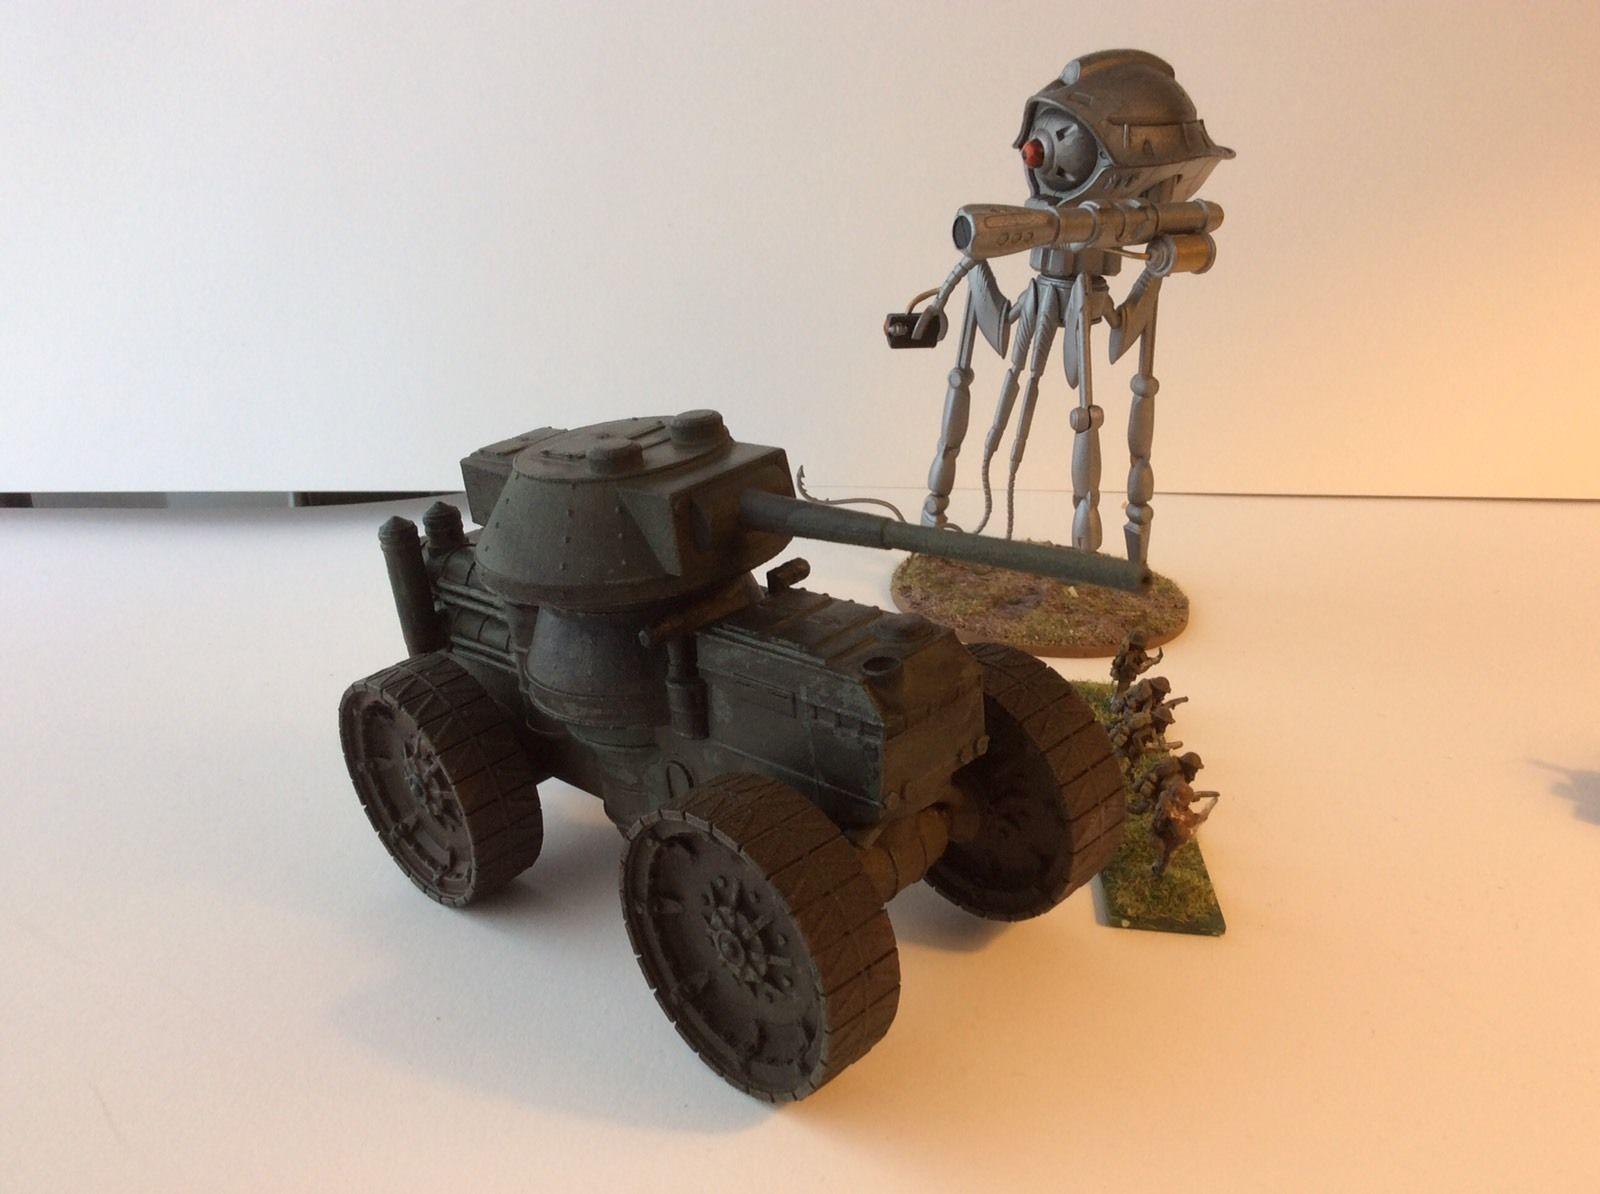 Aqmf brazos evil empire: tanker's tuesday : aqmf, us army samson